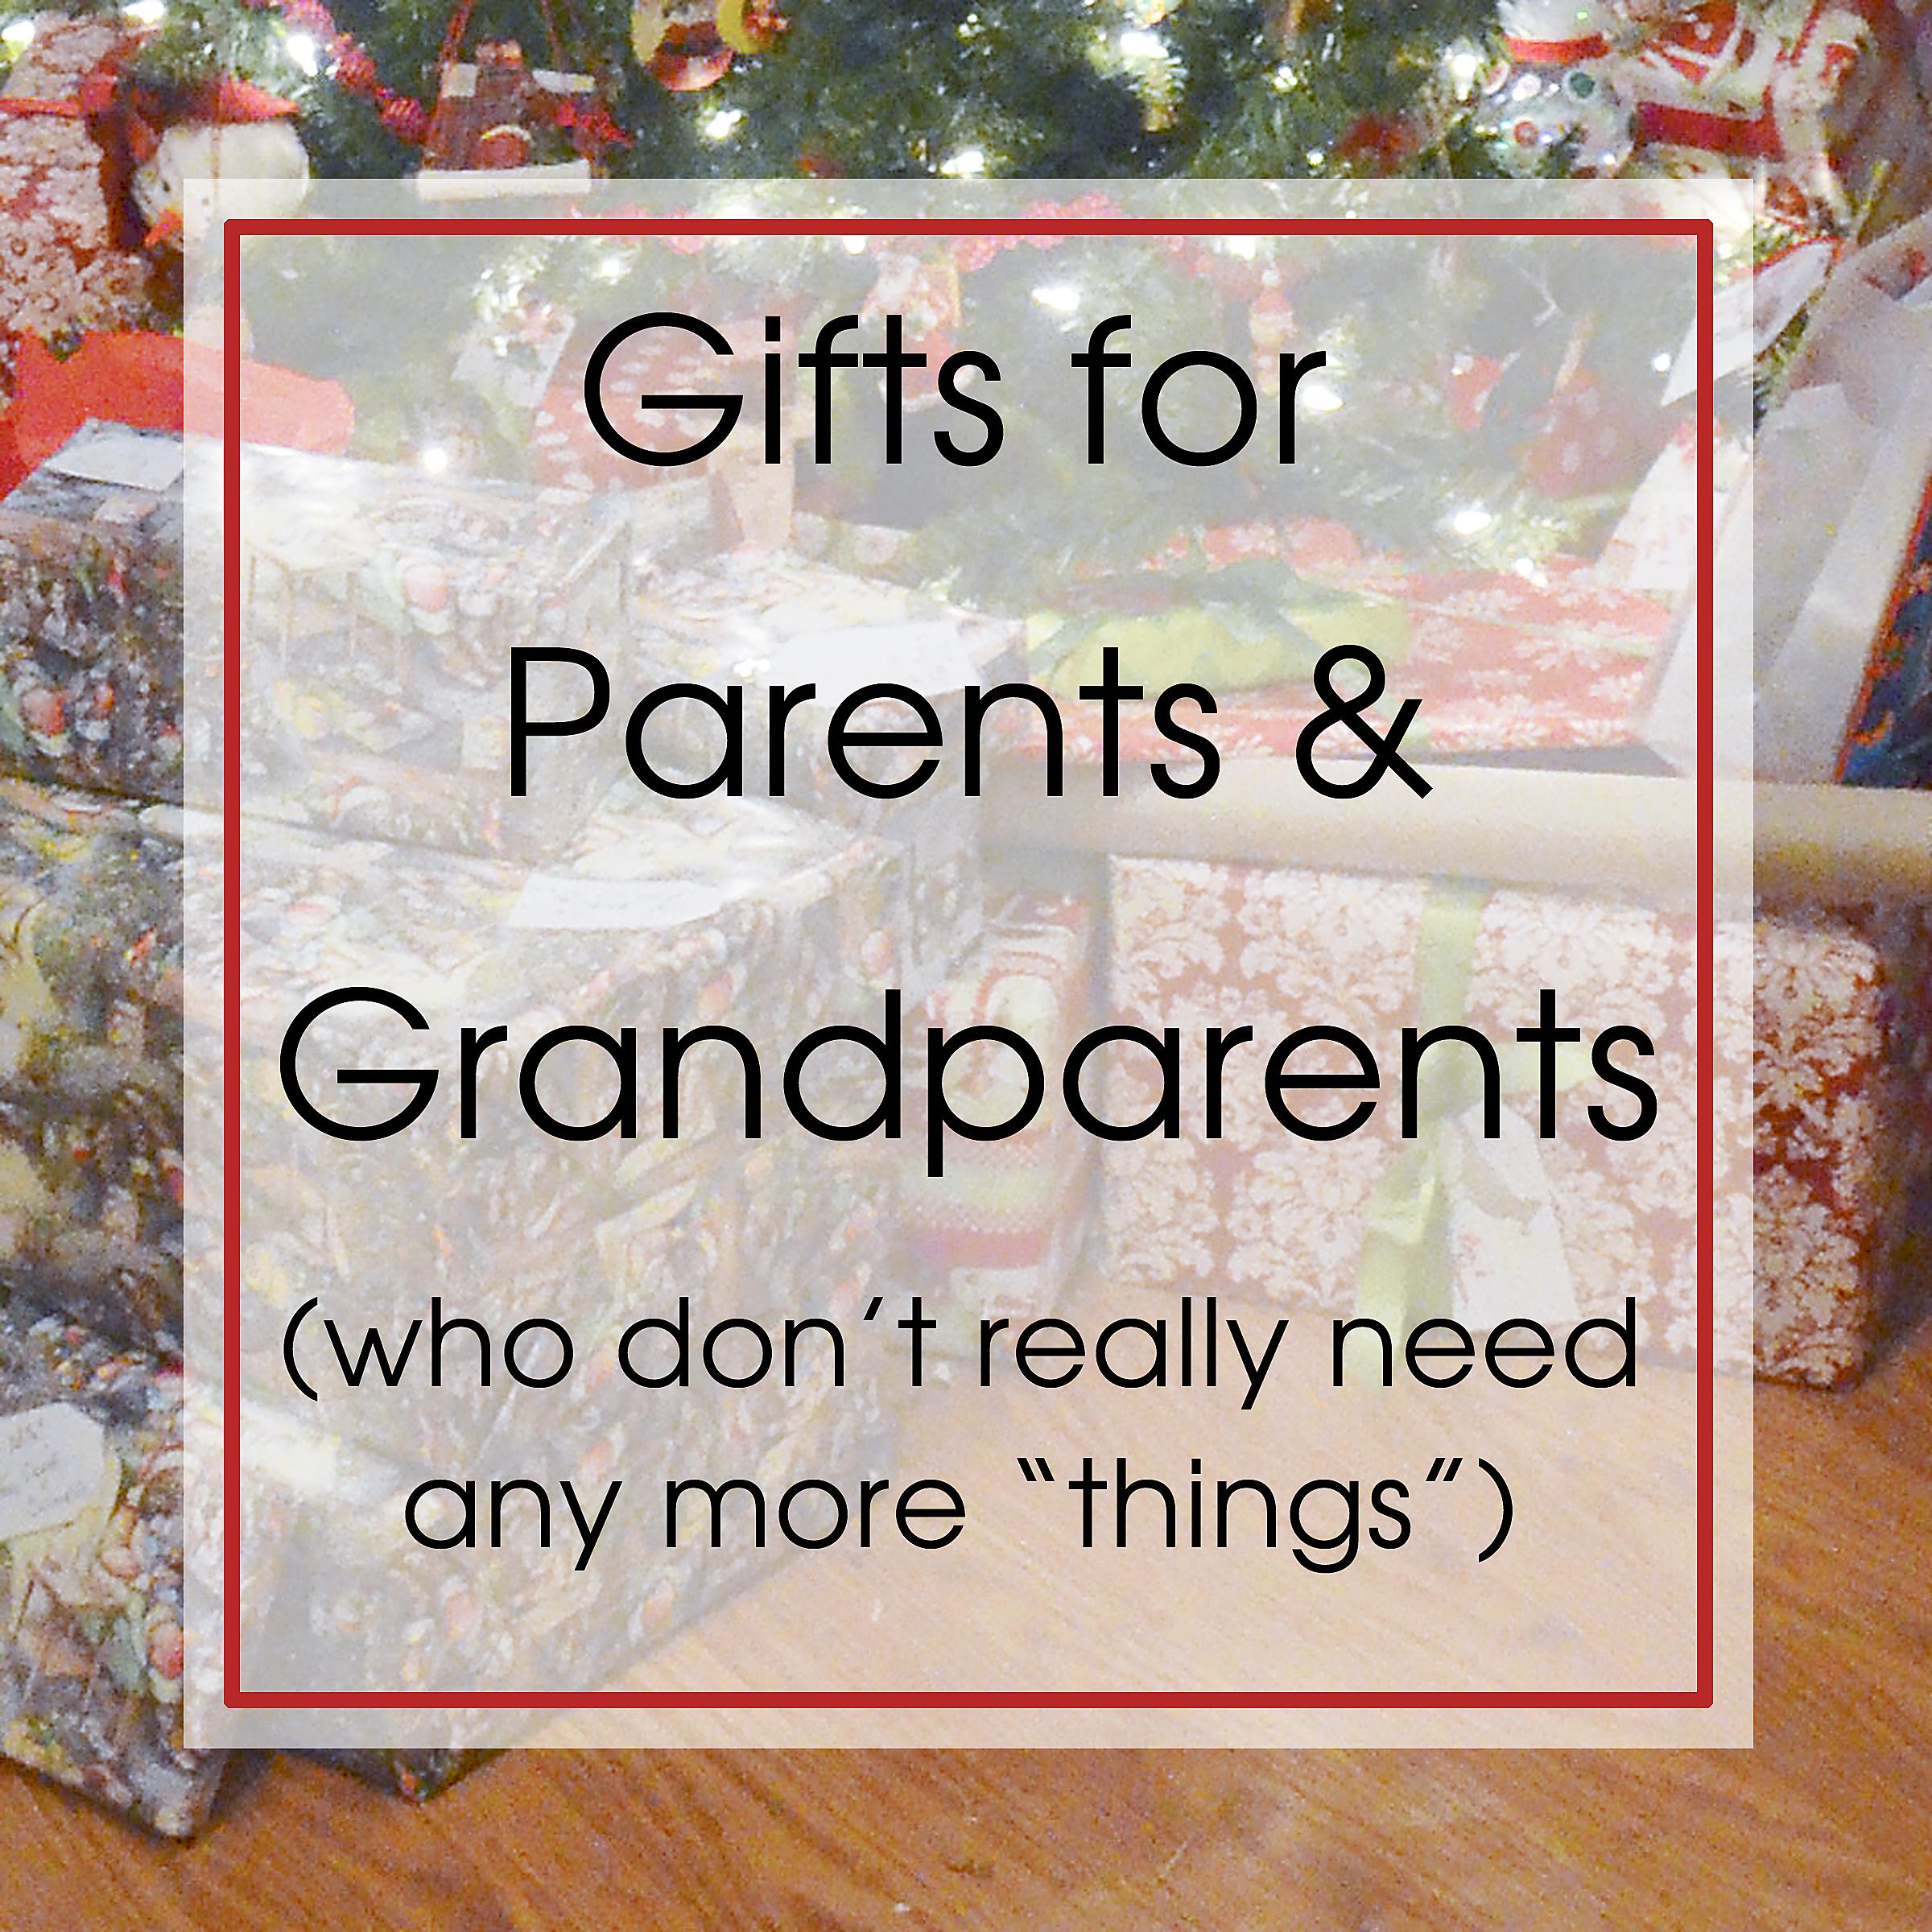 GiftsForParentsAndGrandparents.jpg